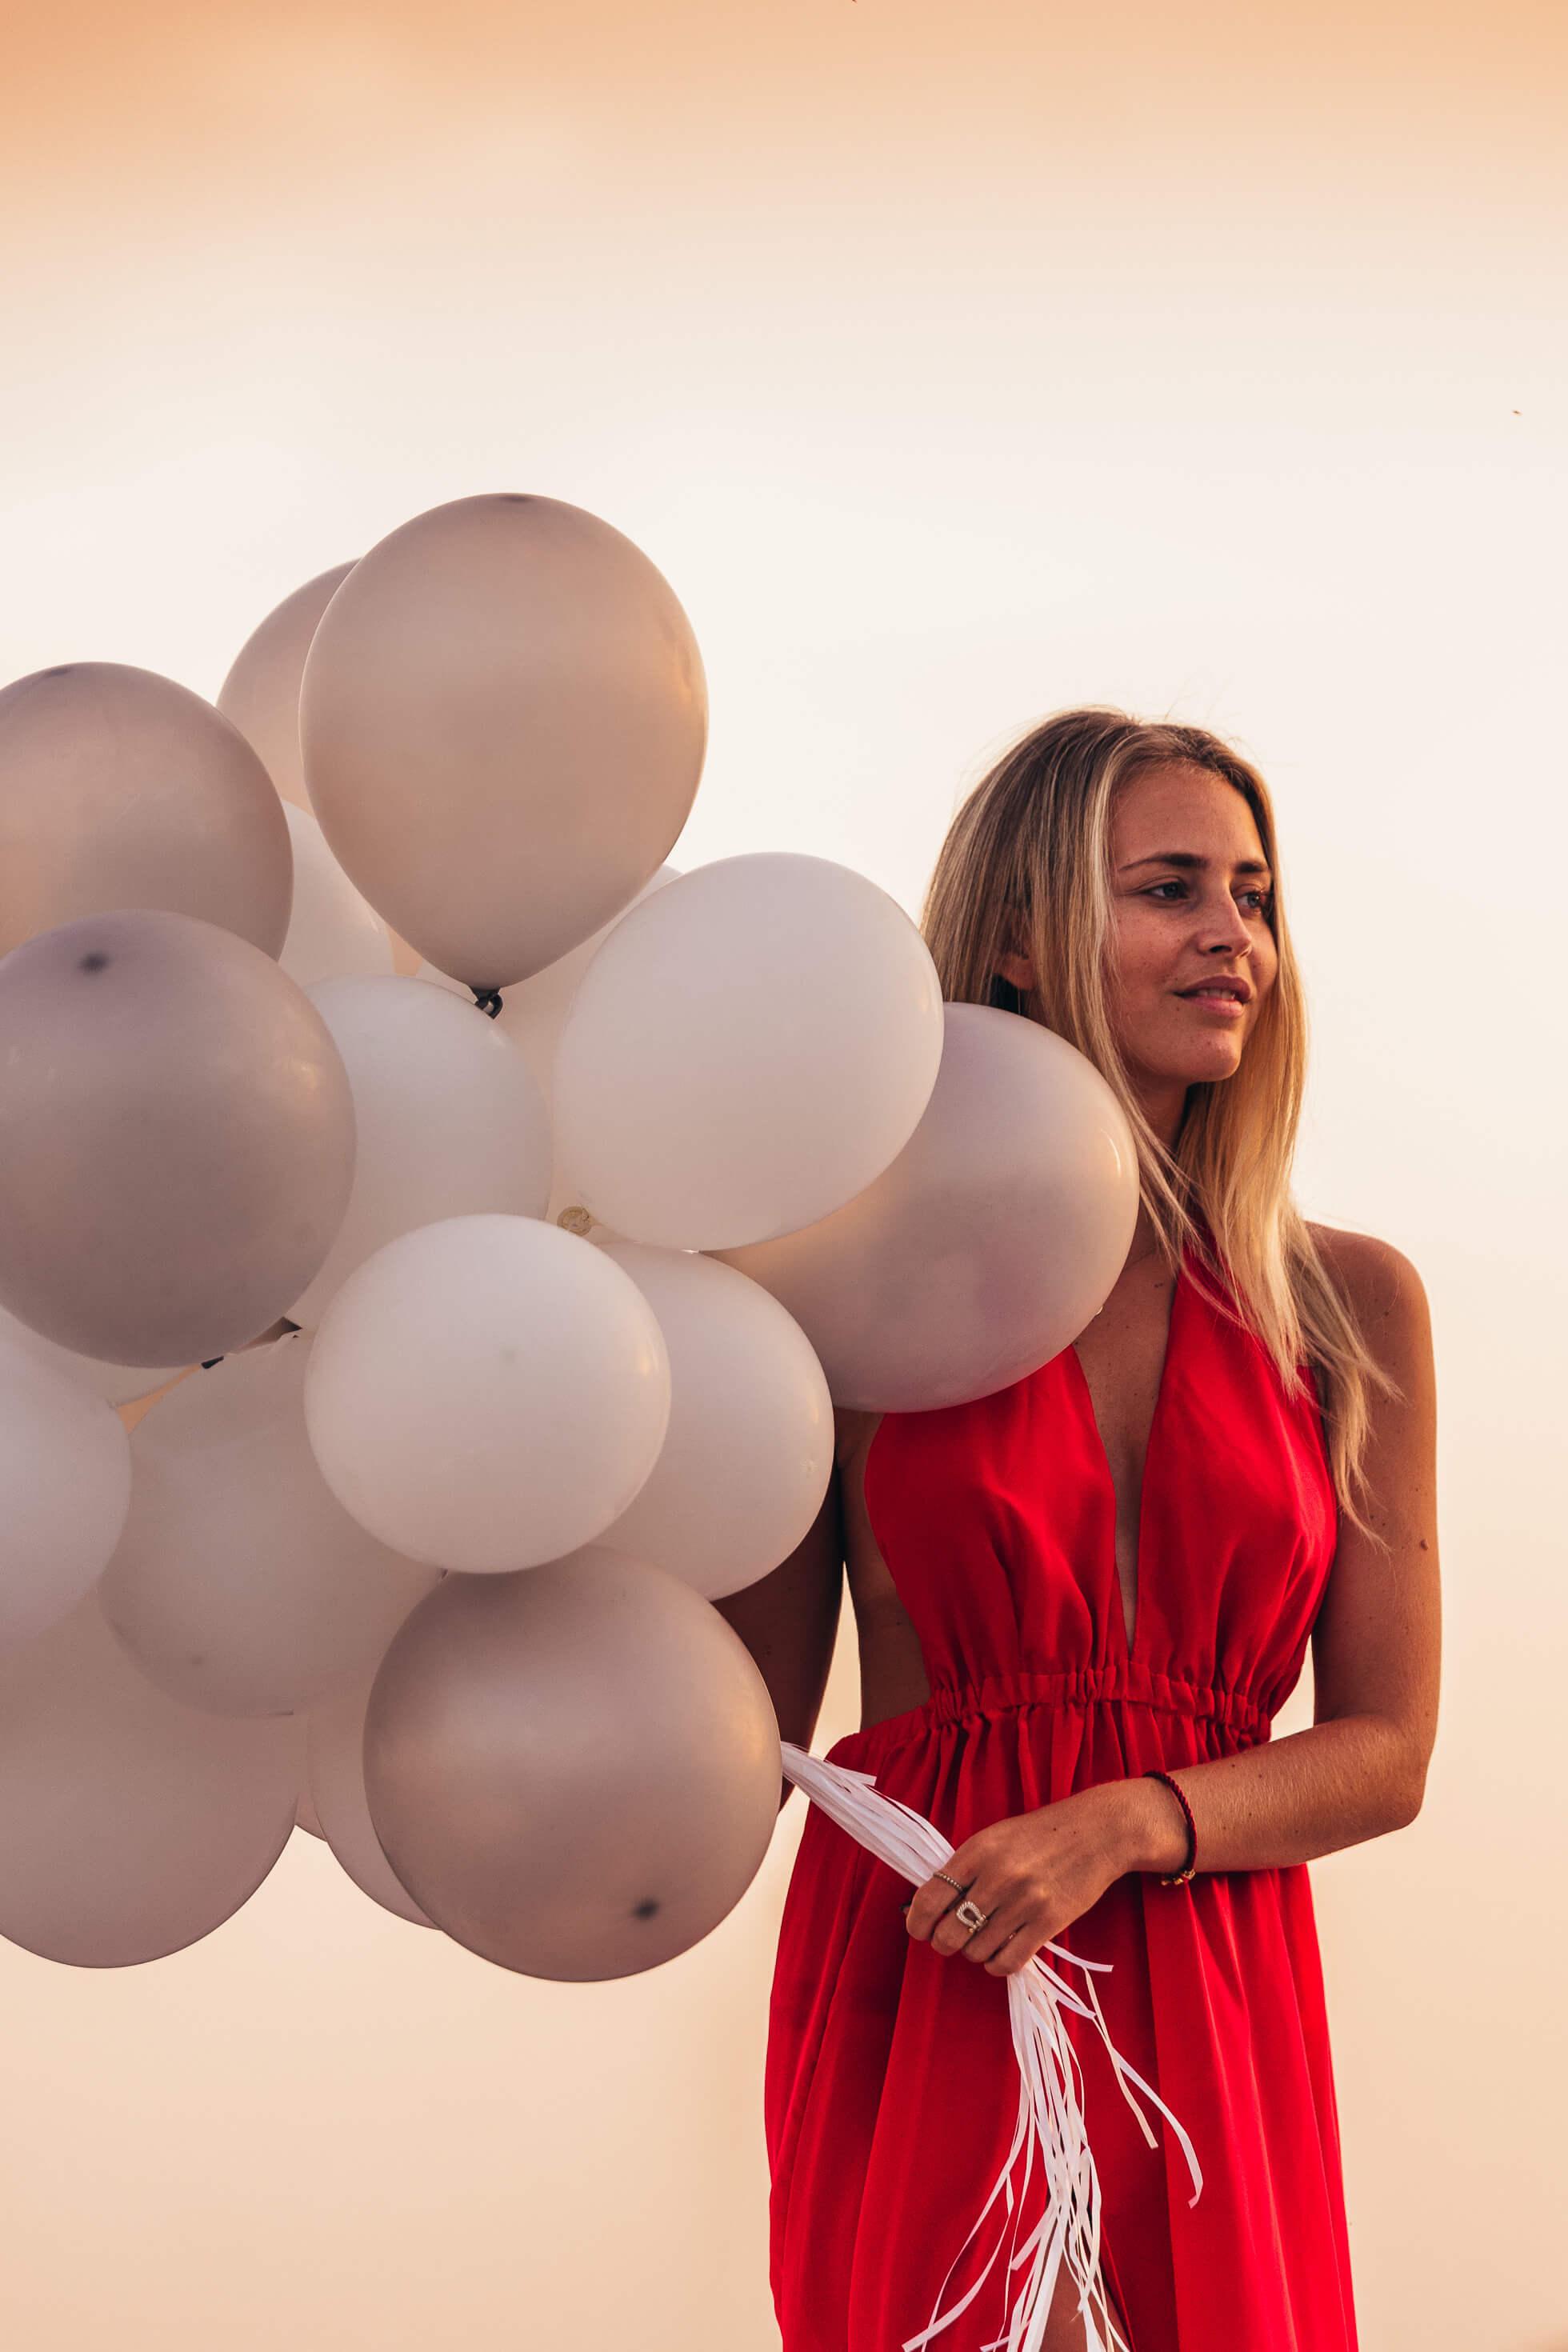 janni-deler-balloon-marbellaj1280325